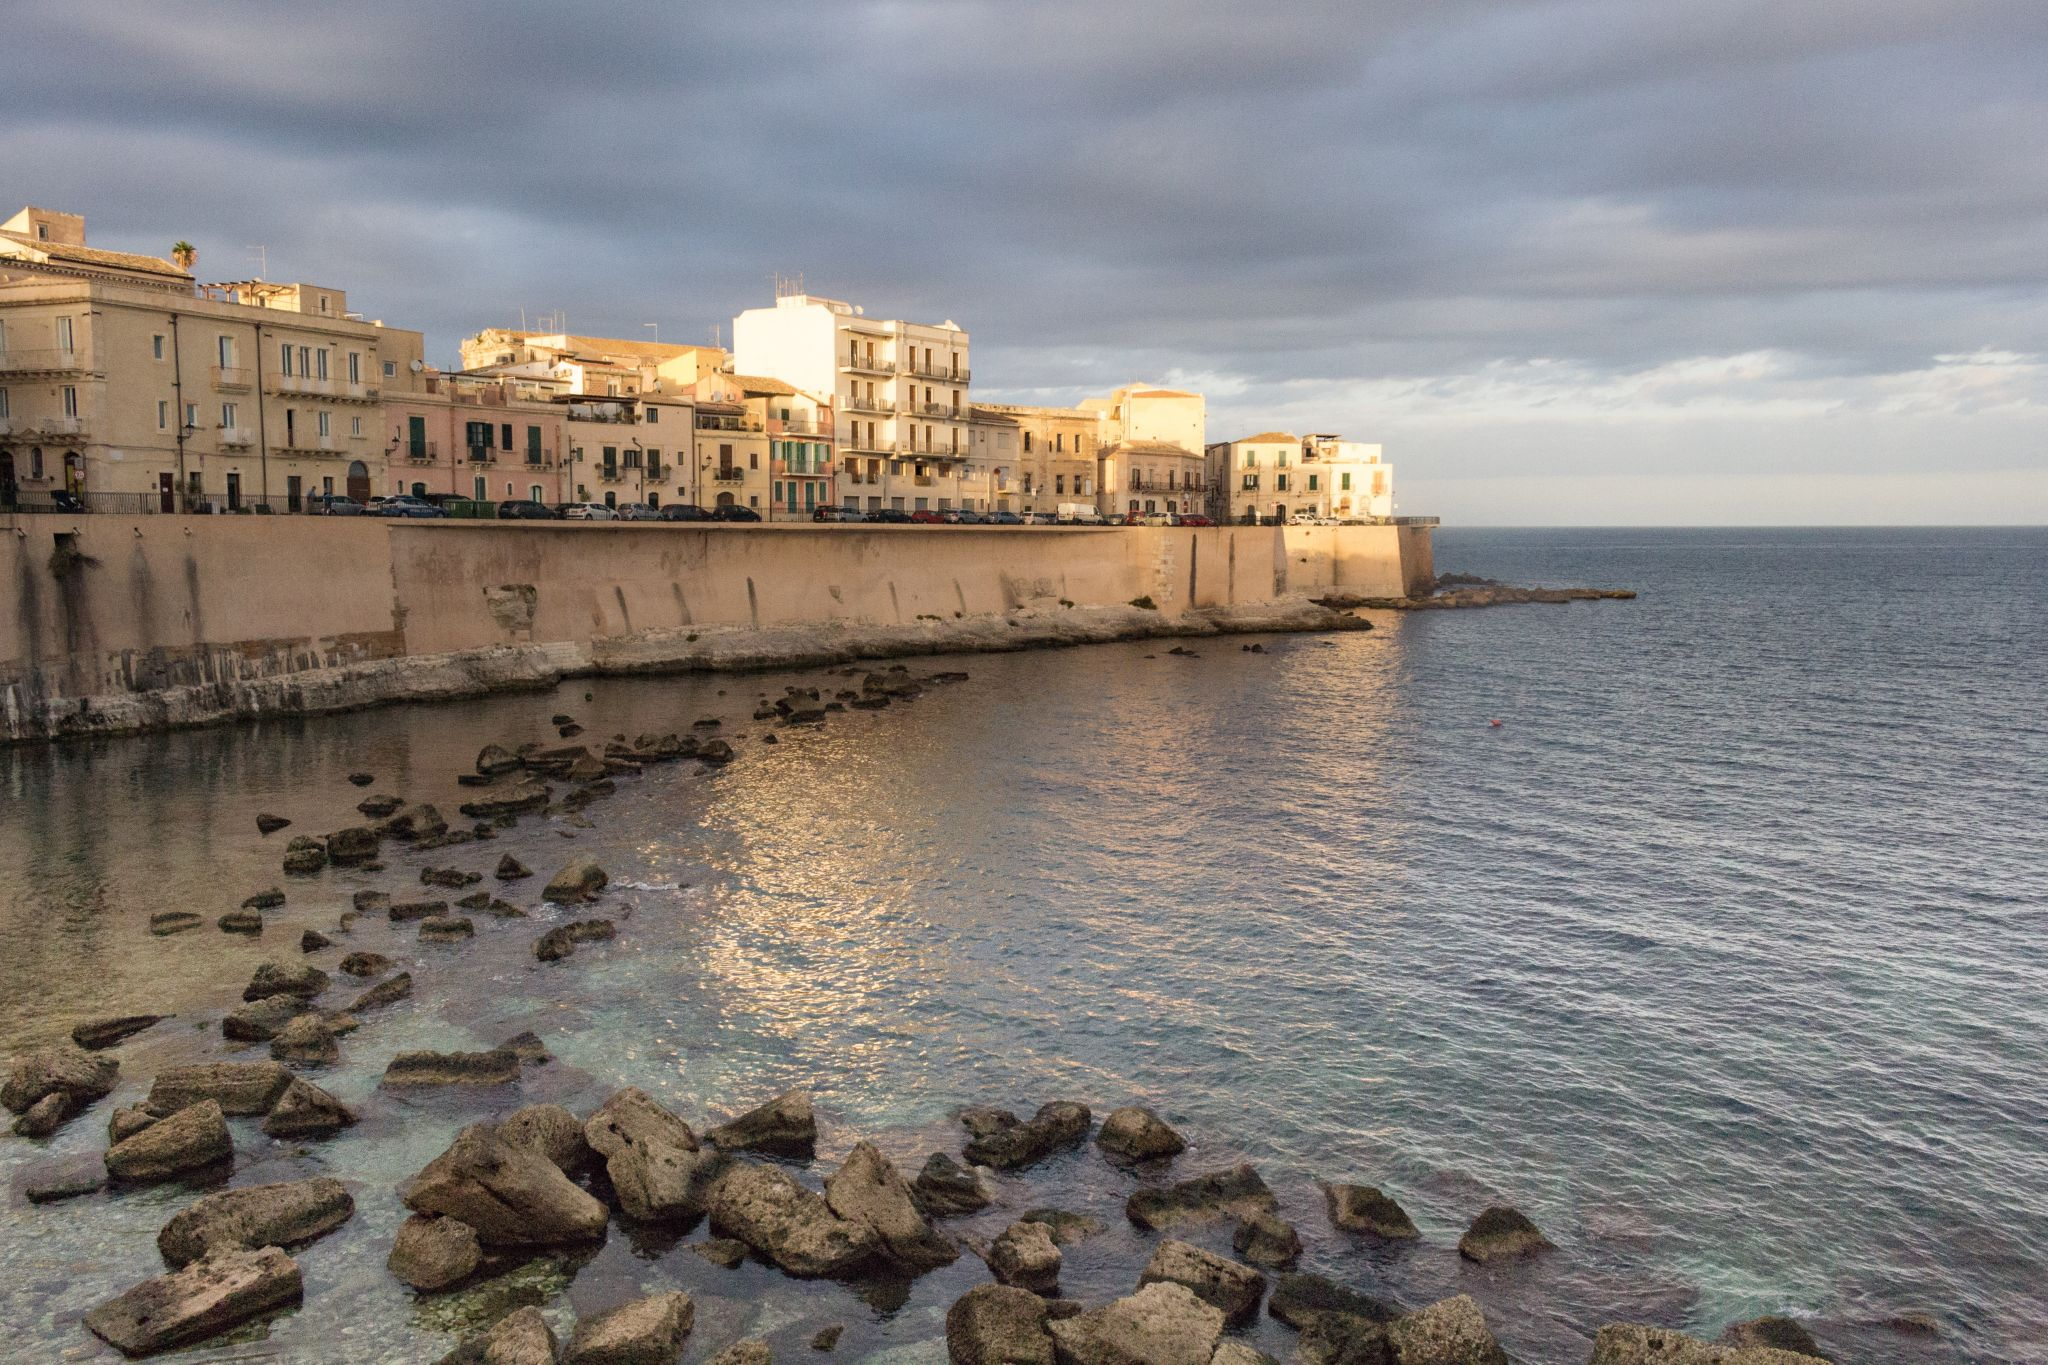 Siracusa Sicily, Italy